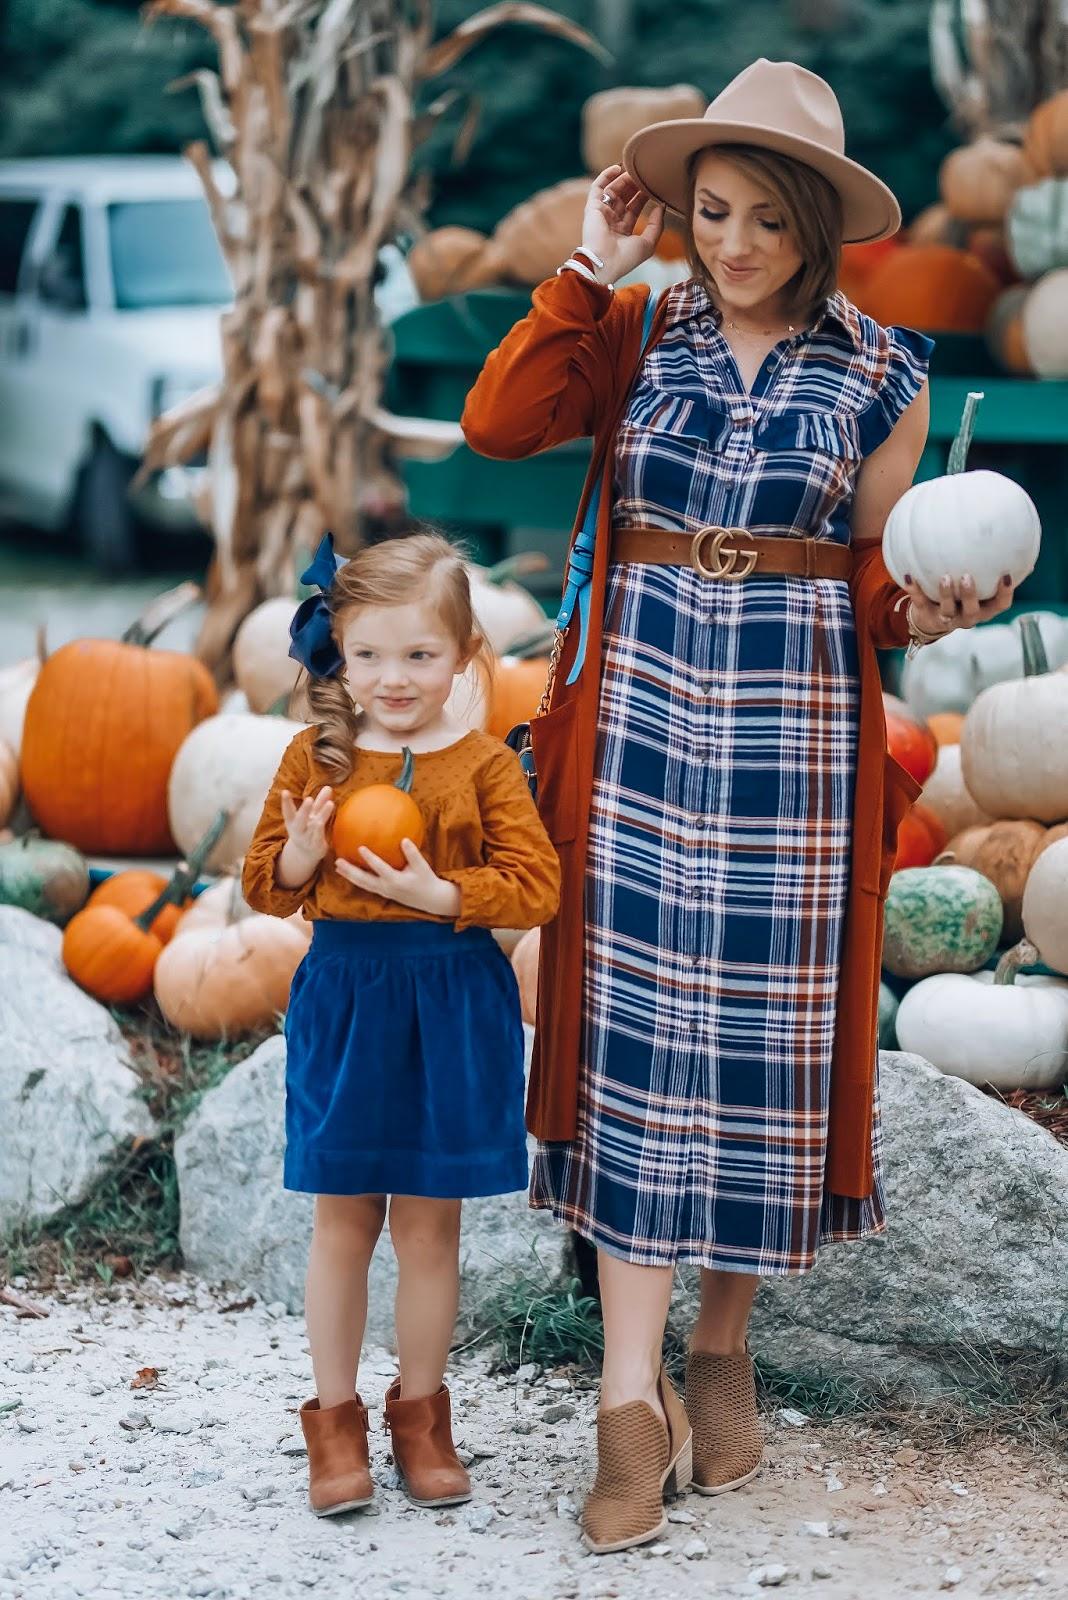 Roadside Pumpkin Stand in Highlands + Under $30 Plaid Flannel Midi Dress - Something Delightful Blog #targetstyle #fallstyle #affordablefashion